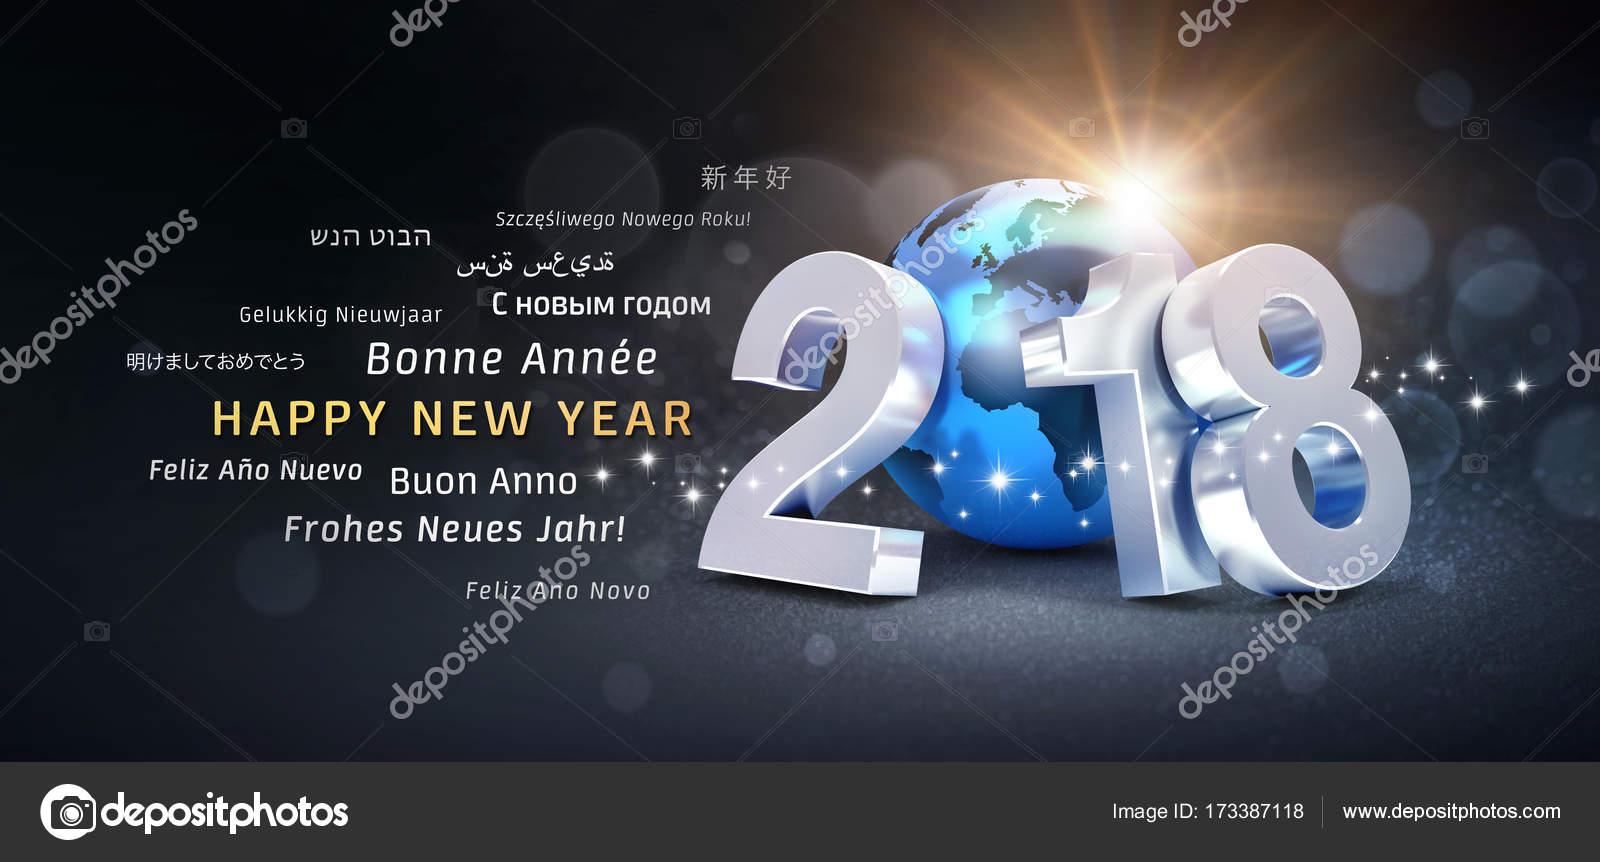 Happy new year 2018 international greetings stock photo happy new year 2018 international greetings stock photo m4hsunfo